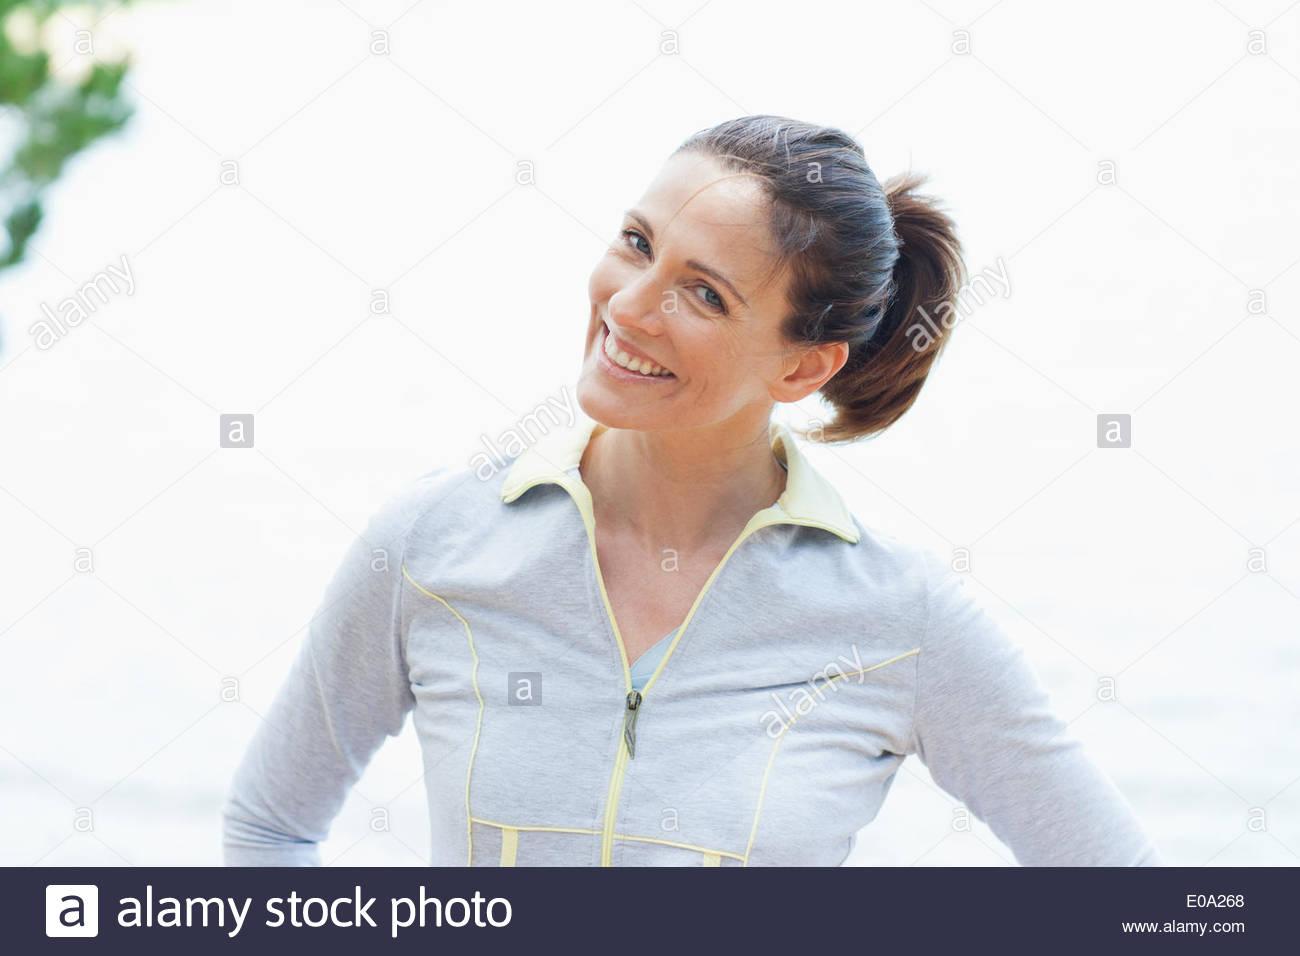 Woman in sportswear smiling Photo Stock